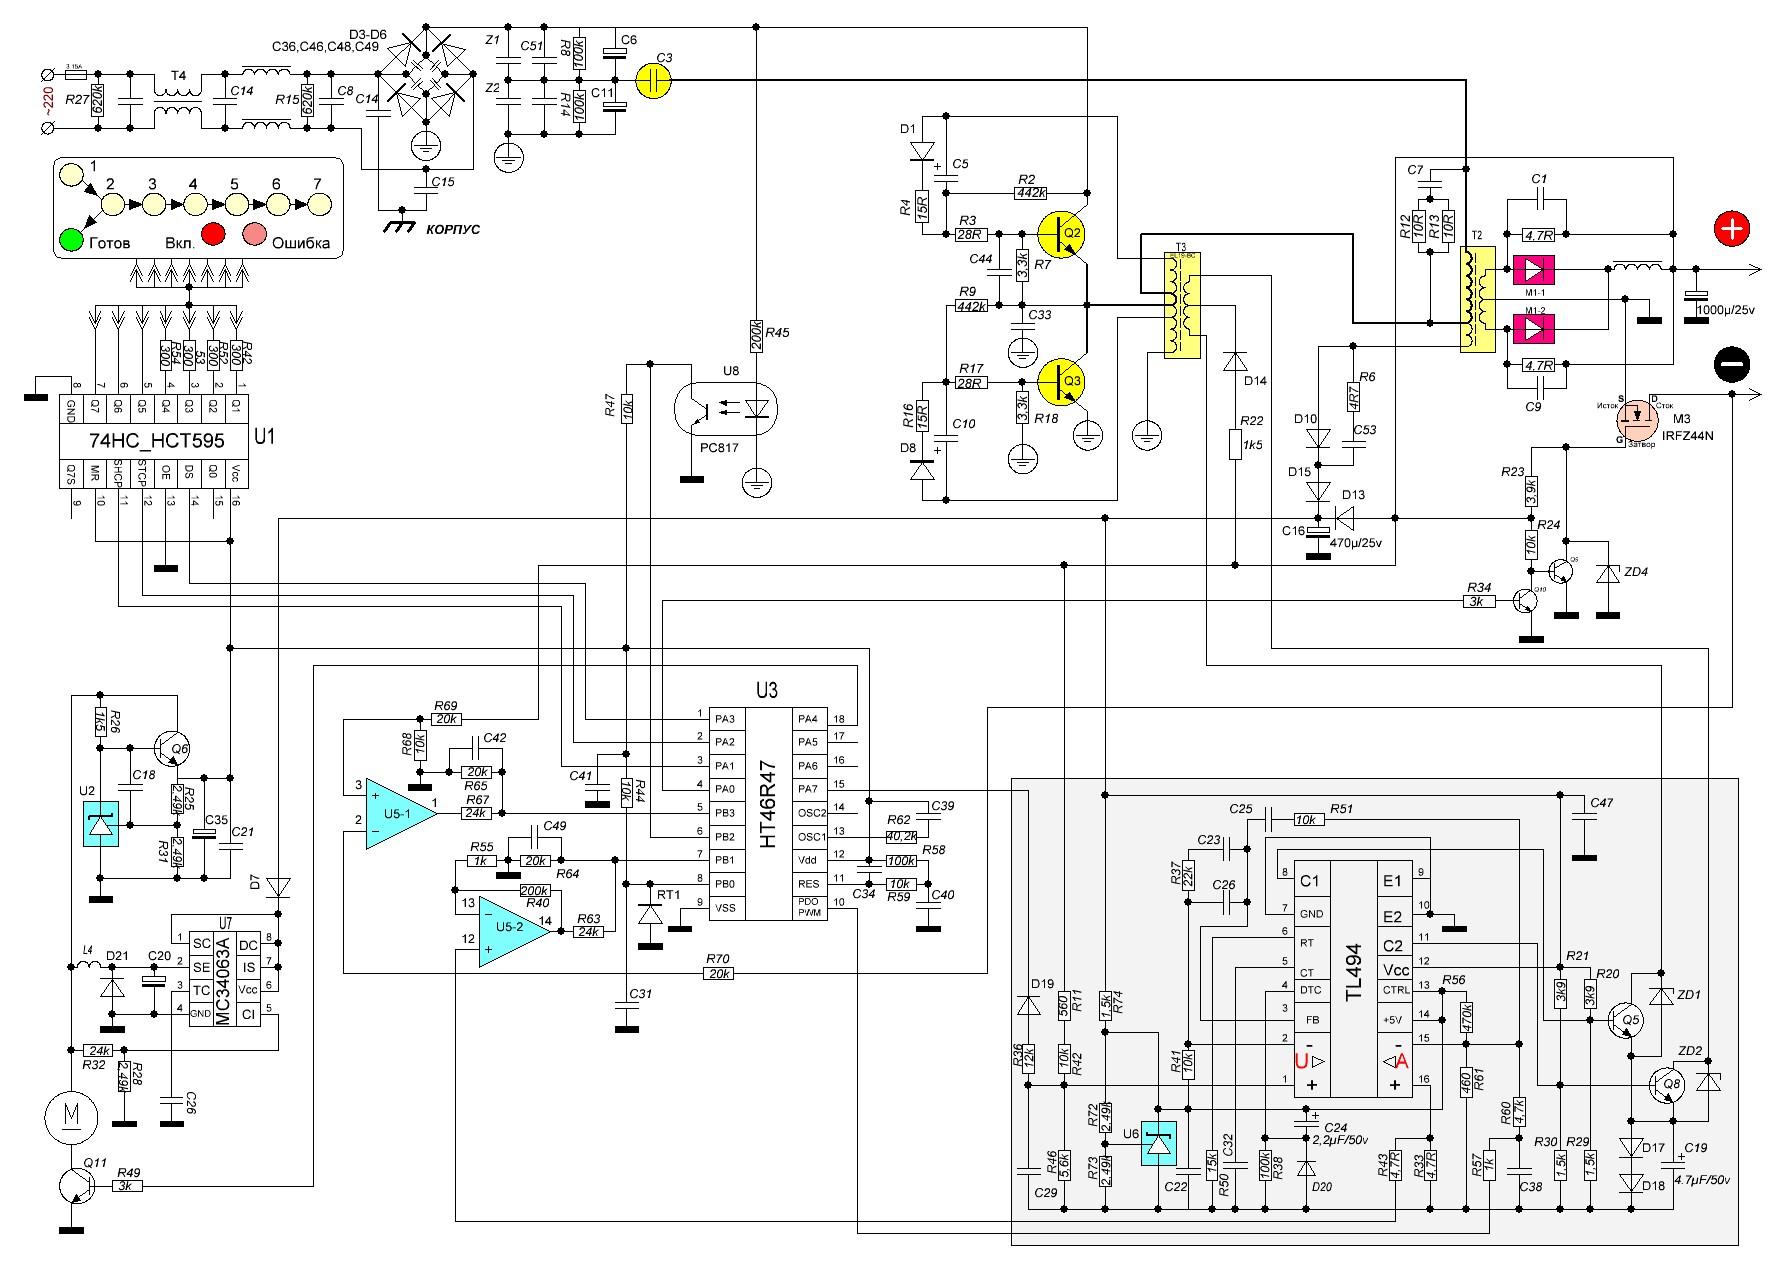 Ht46r23 схема включения